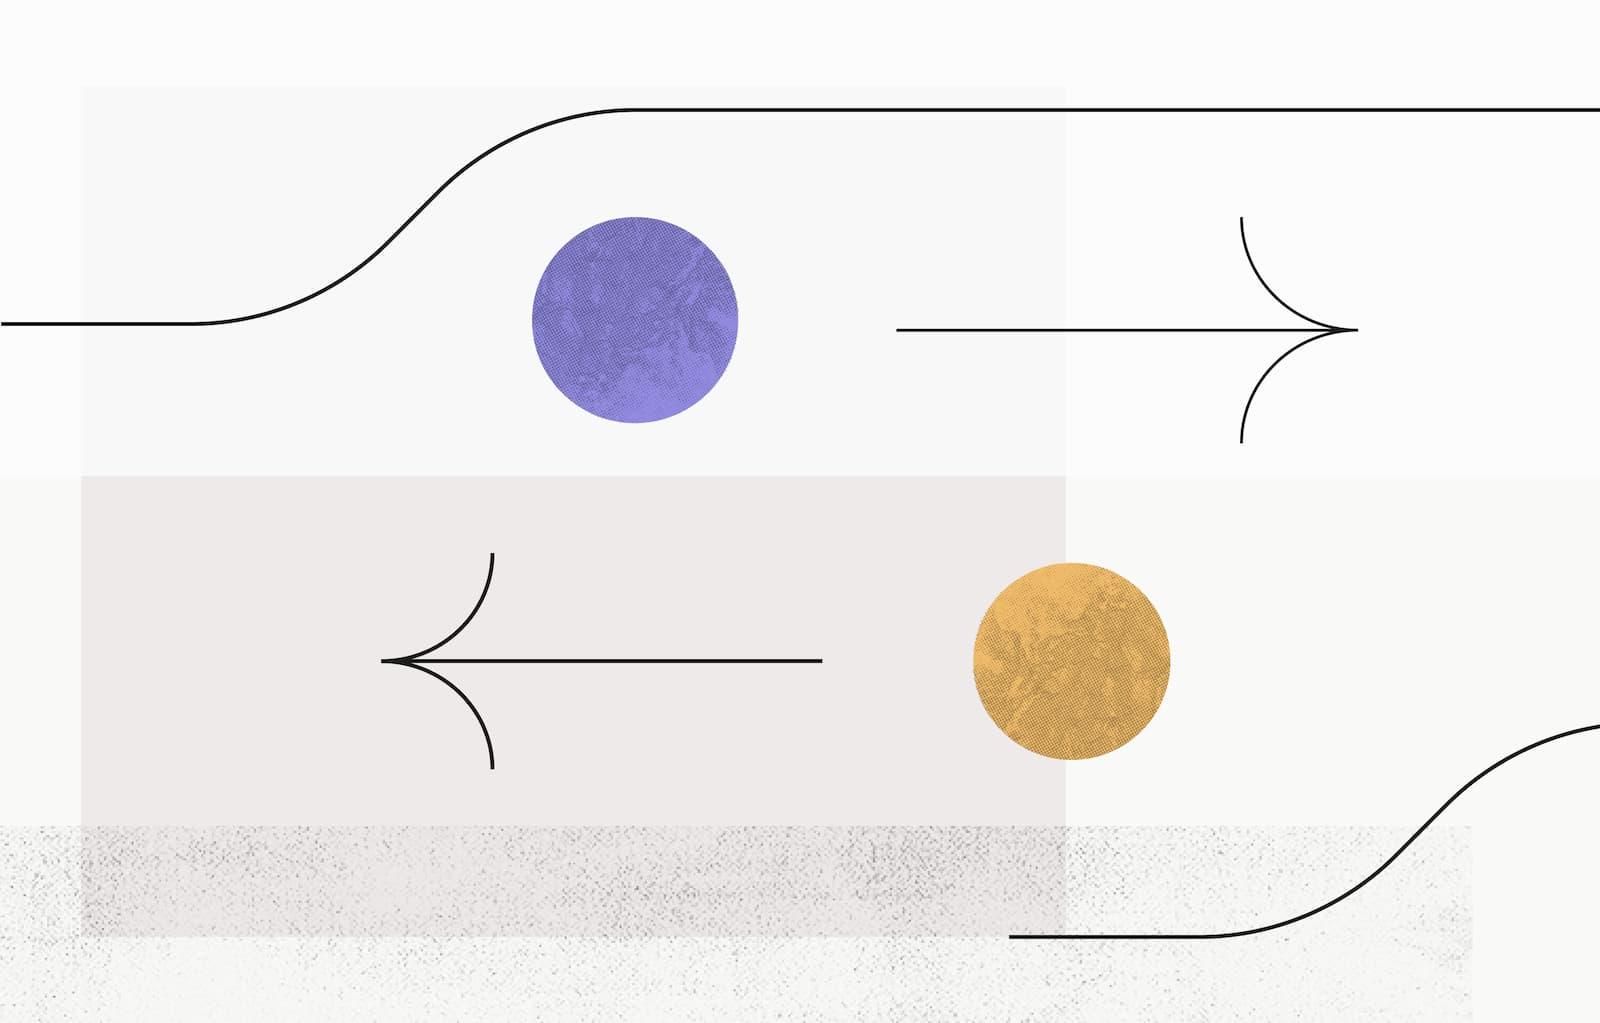 Illustration - 6 steps to build a successful change management process